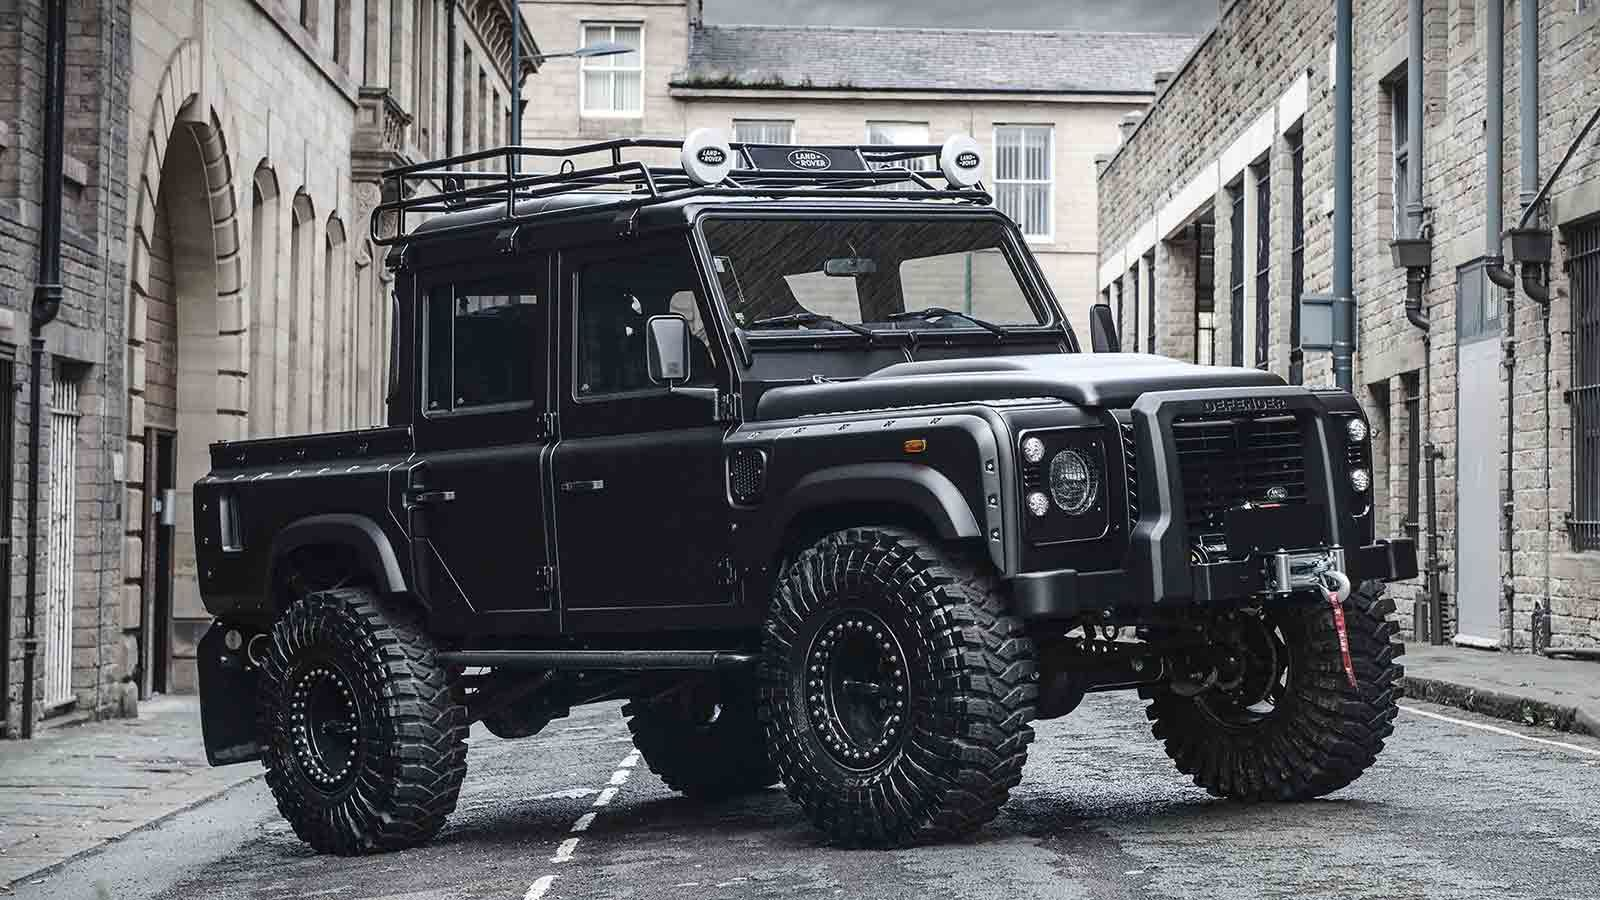 Bigfoot Land Rover Defender By Chelsea Truck Company Muted Land Rover Defender Land Rover Land Rover Defender 110